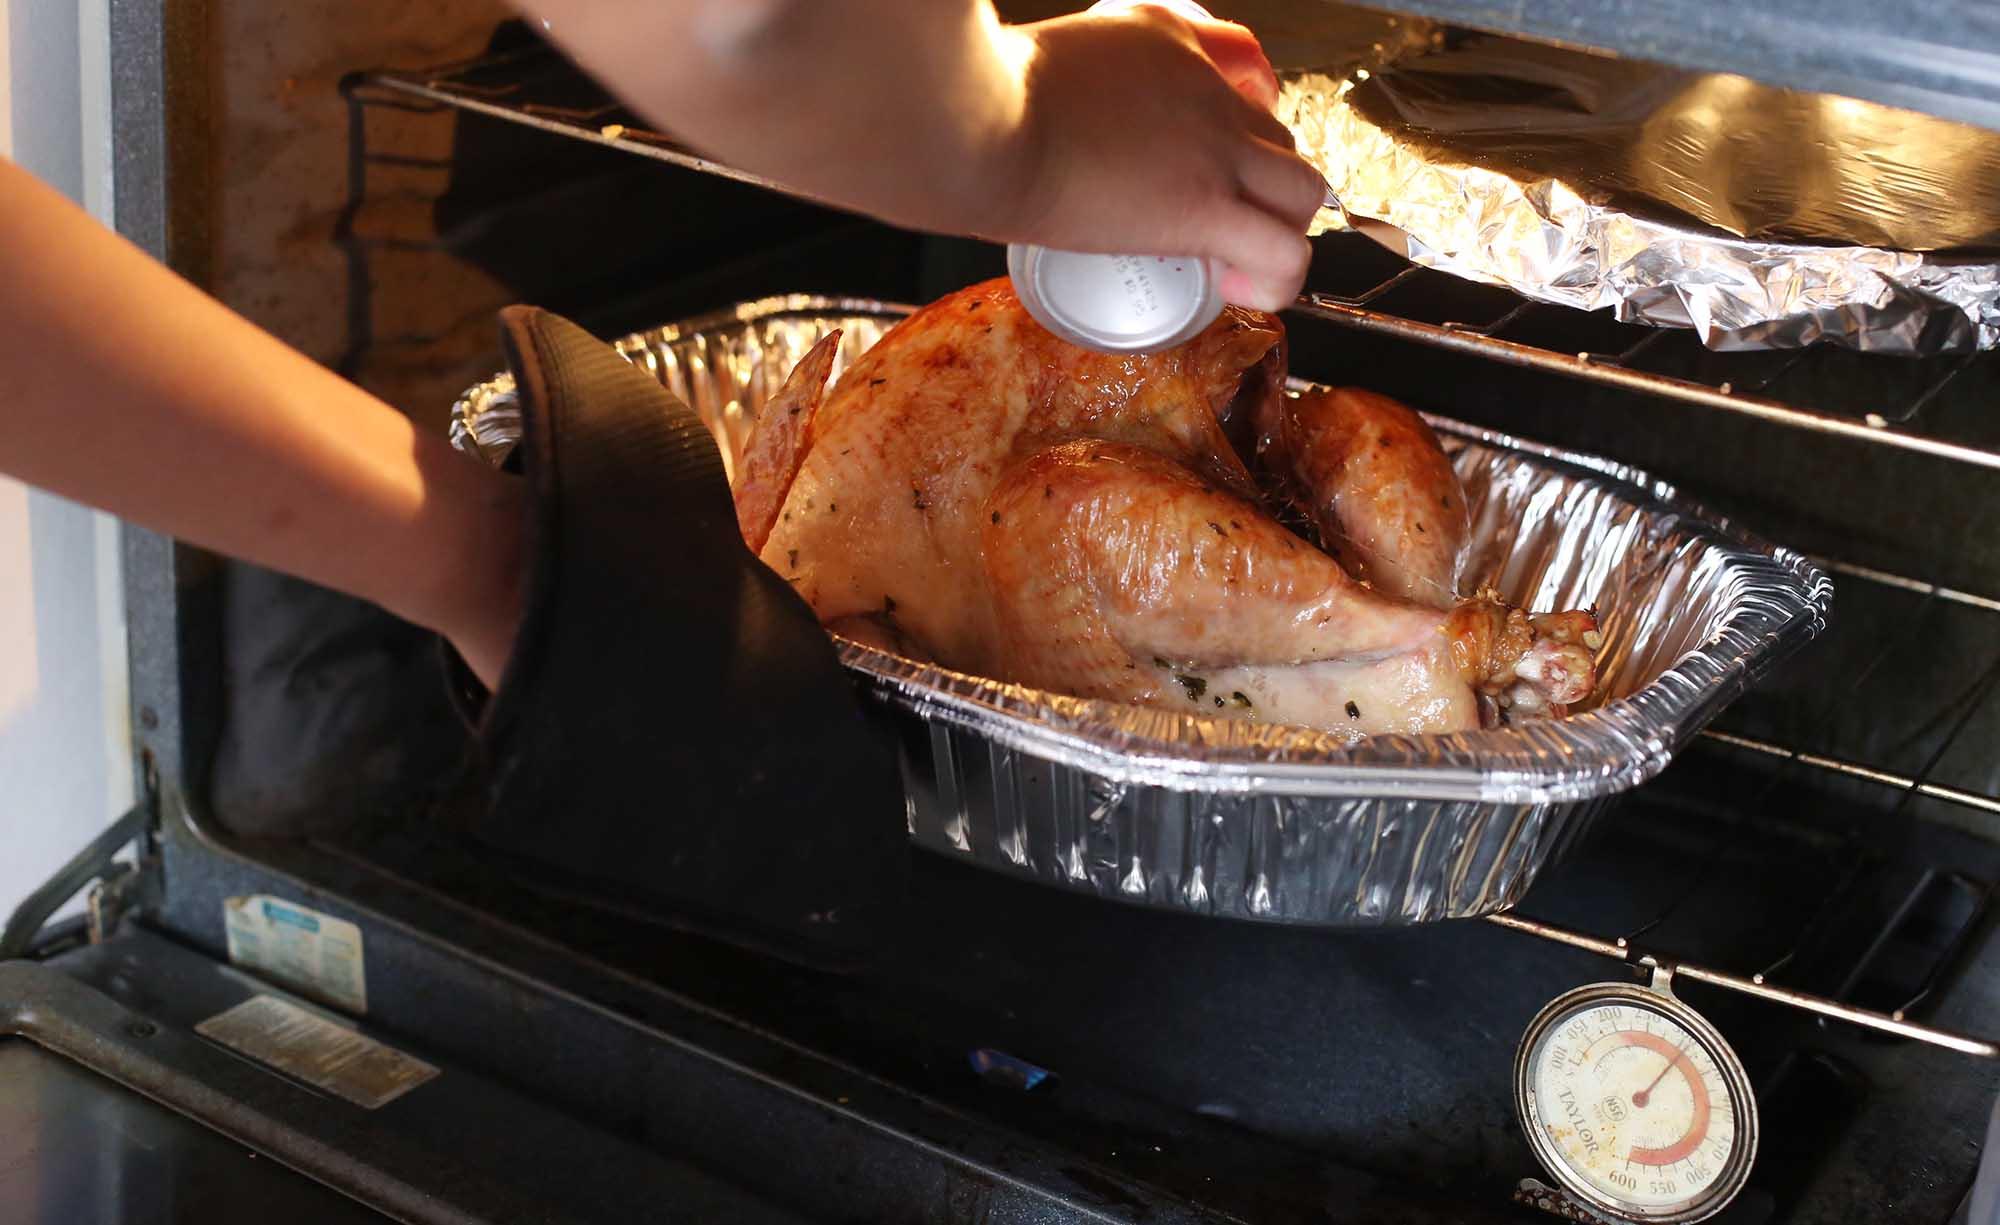 Cinco deliciosas recetas para preparar en nochebuena diario1 for Como cocinar un pavo